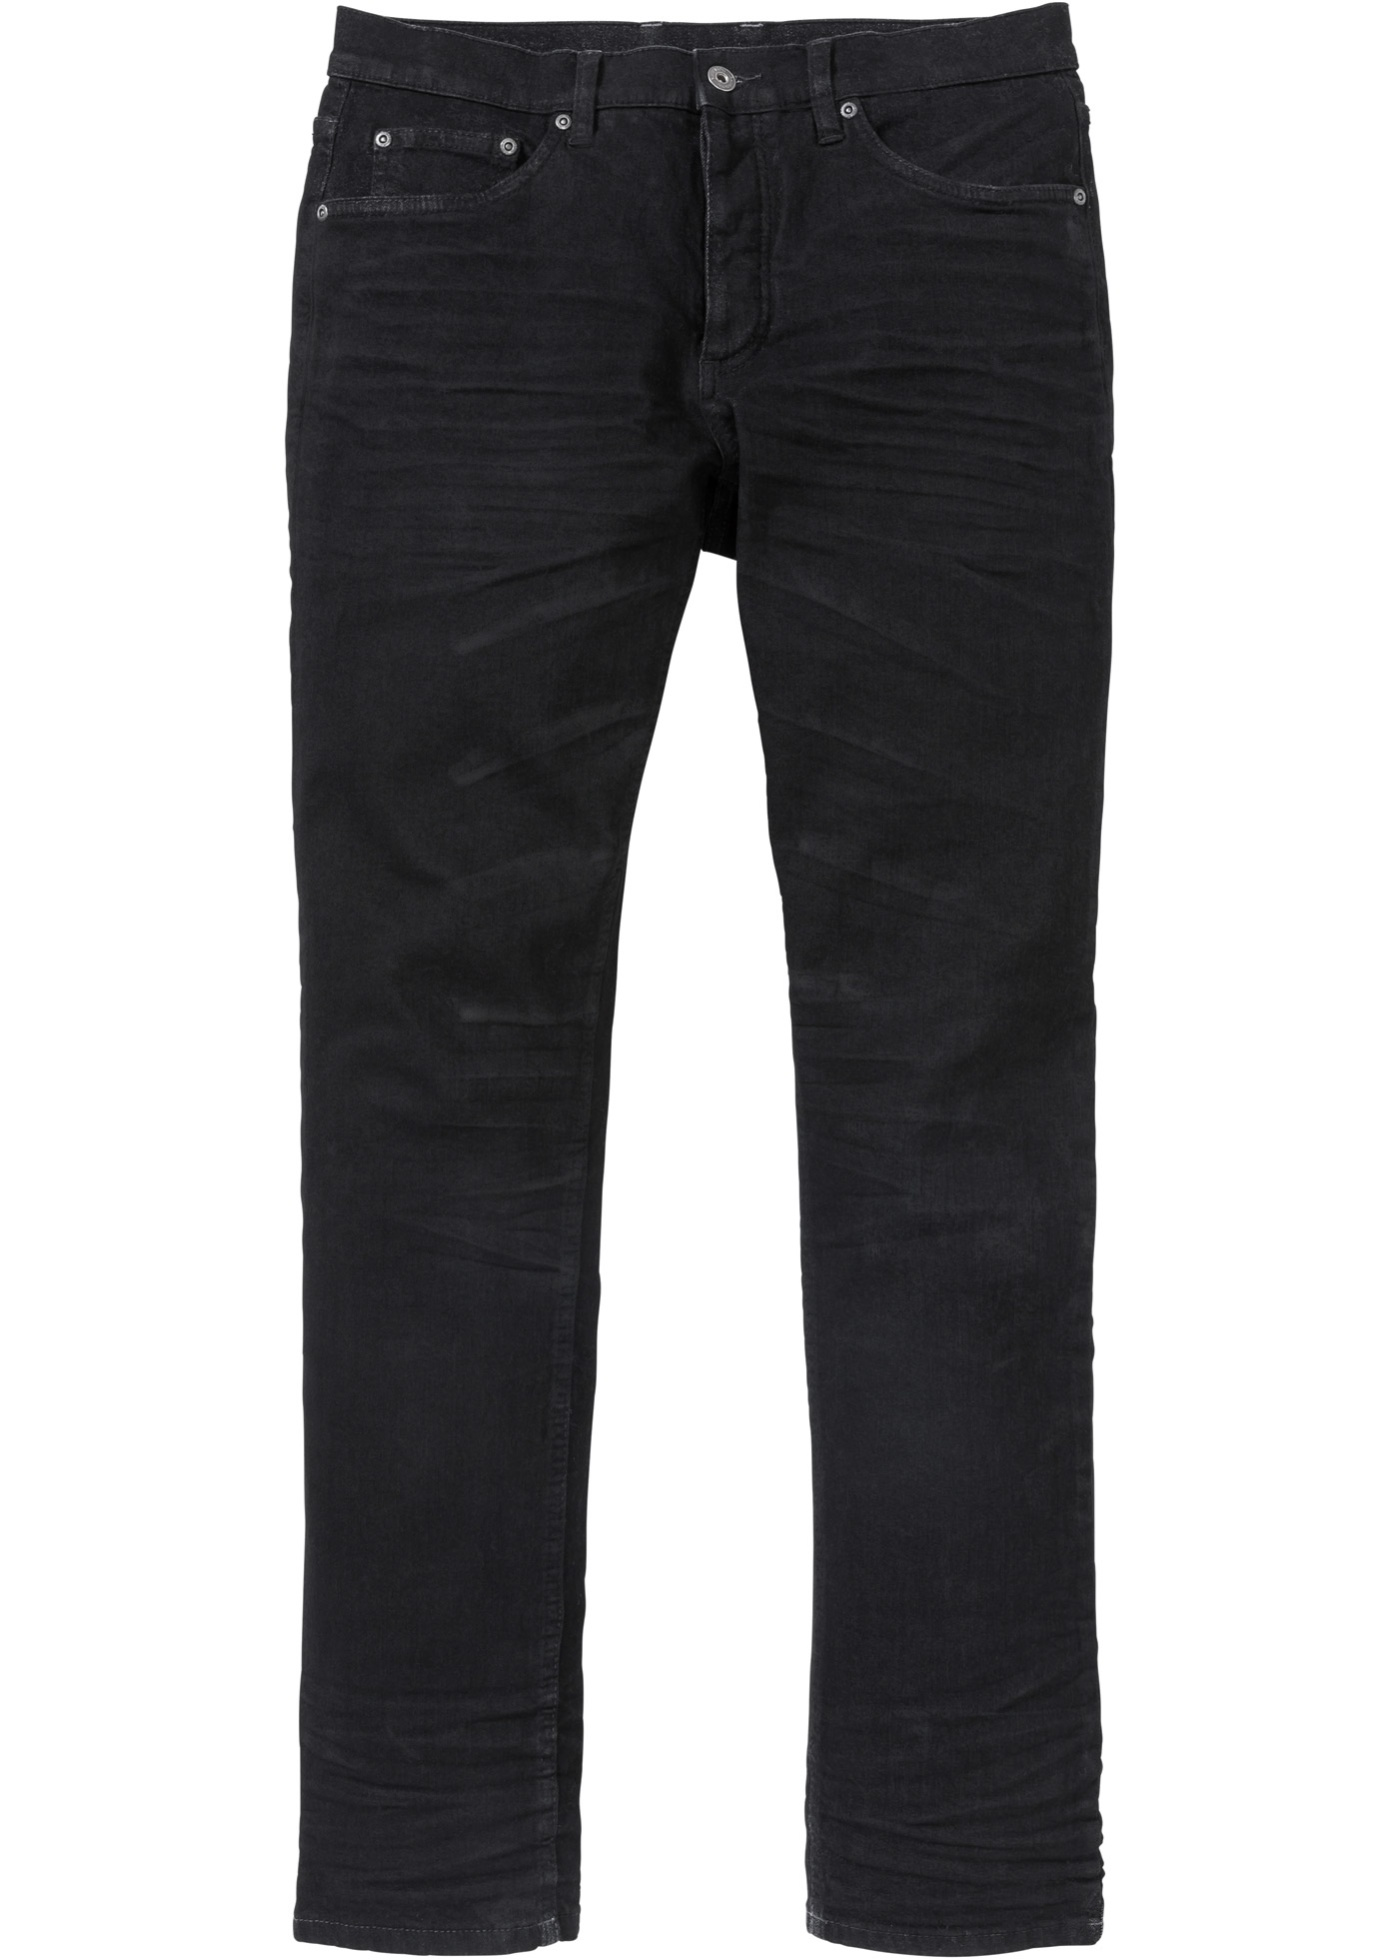 Bonprix SE - Jeans, smal passform, raka ben 359.00